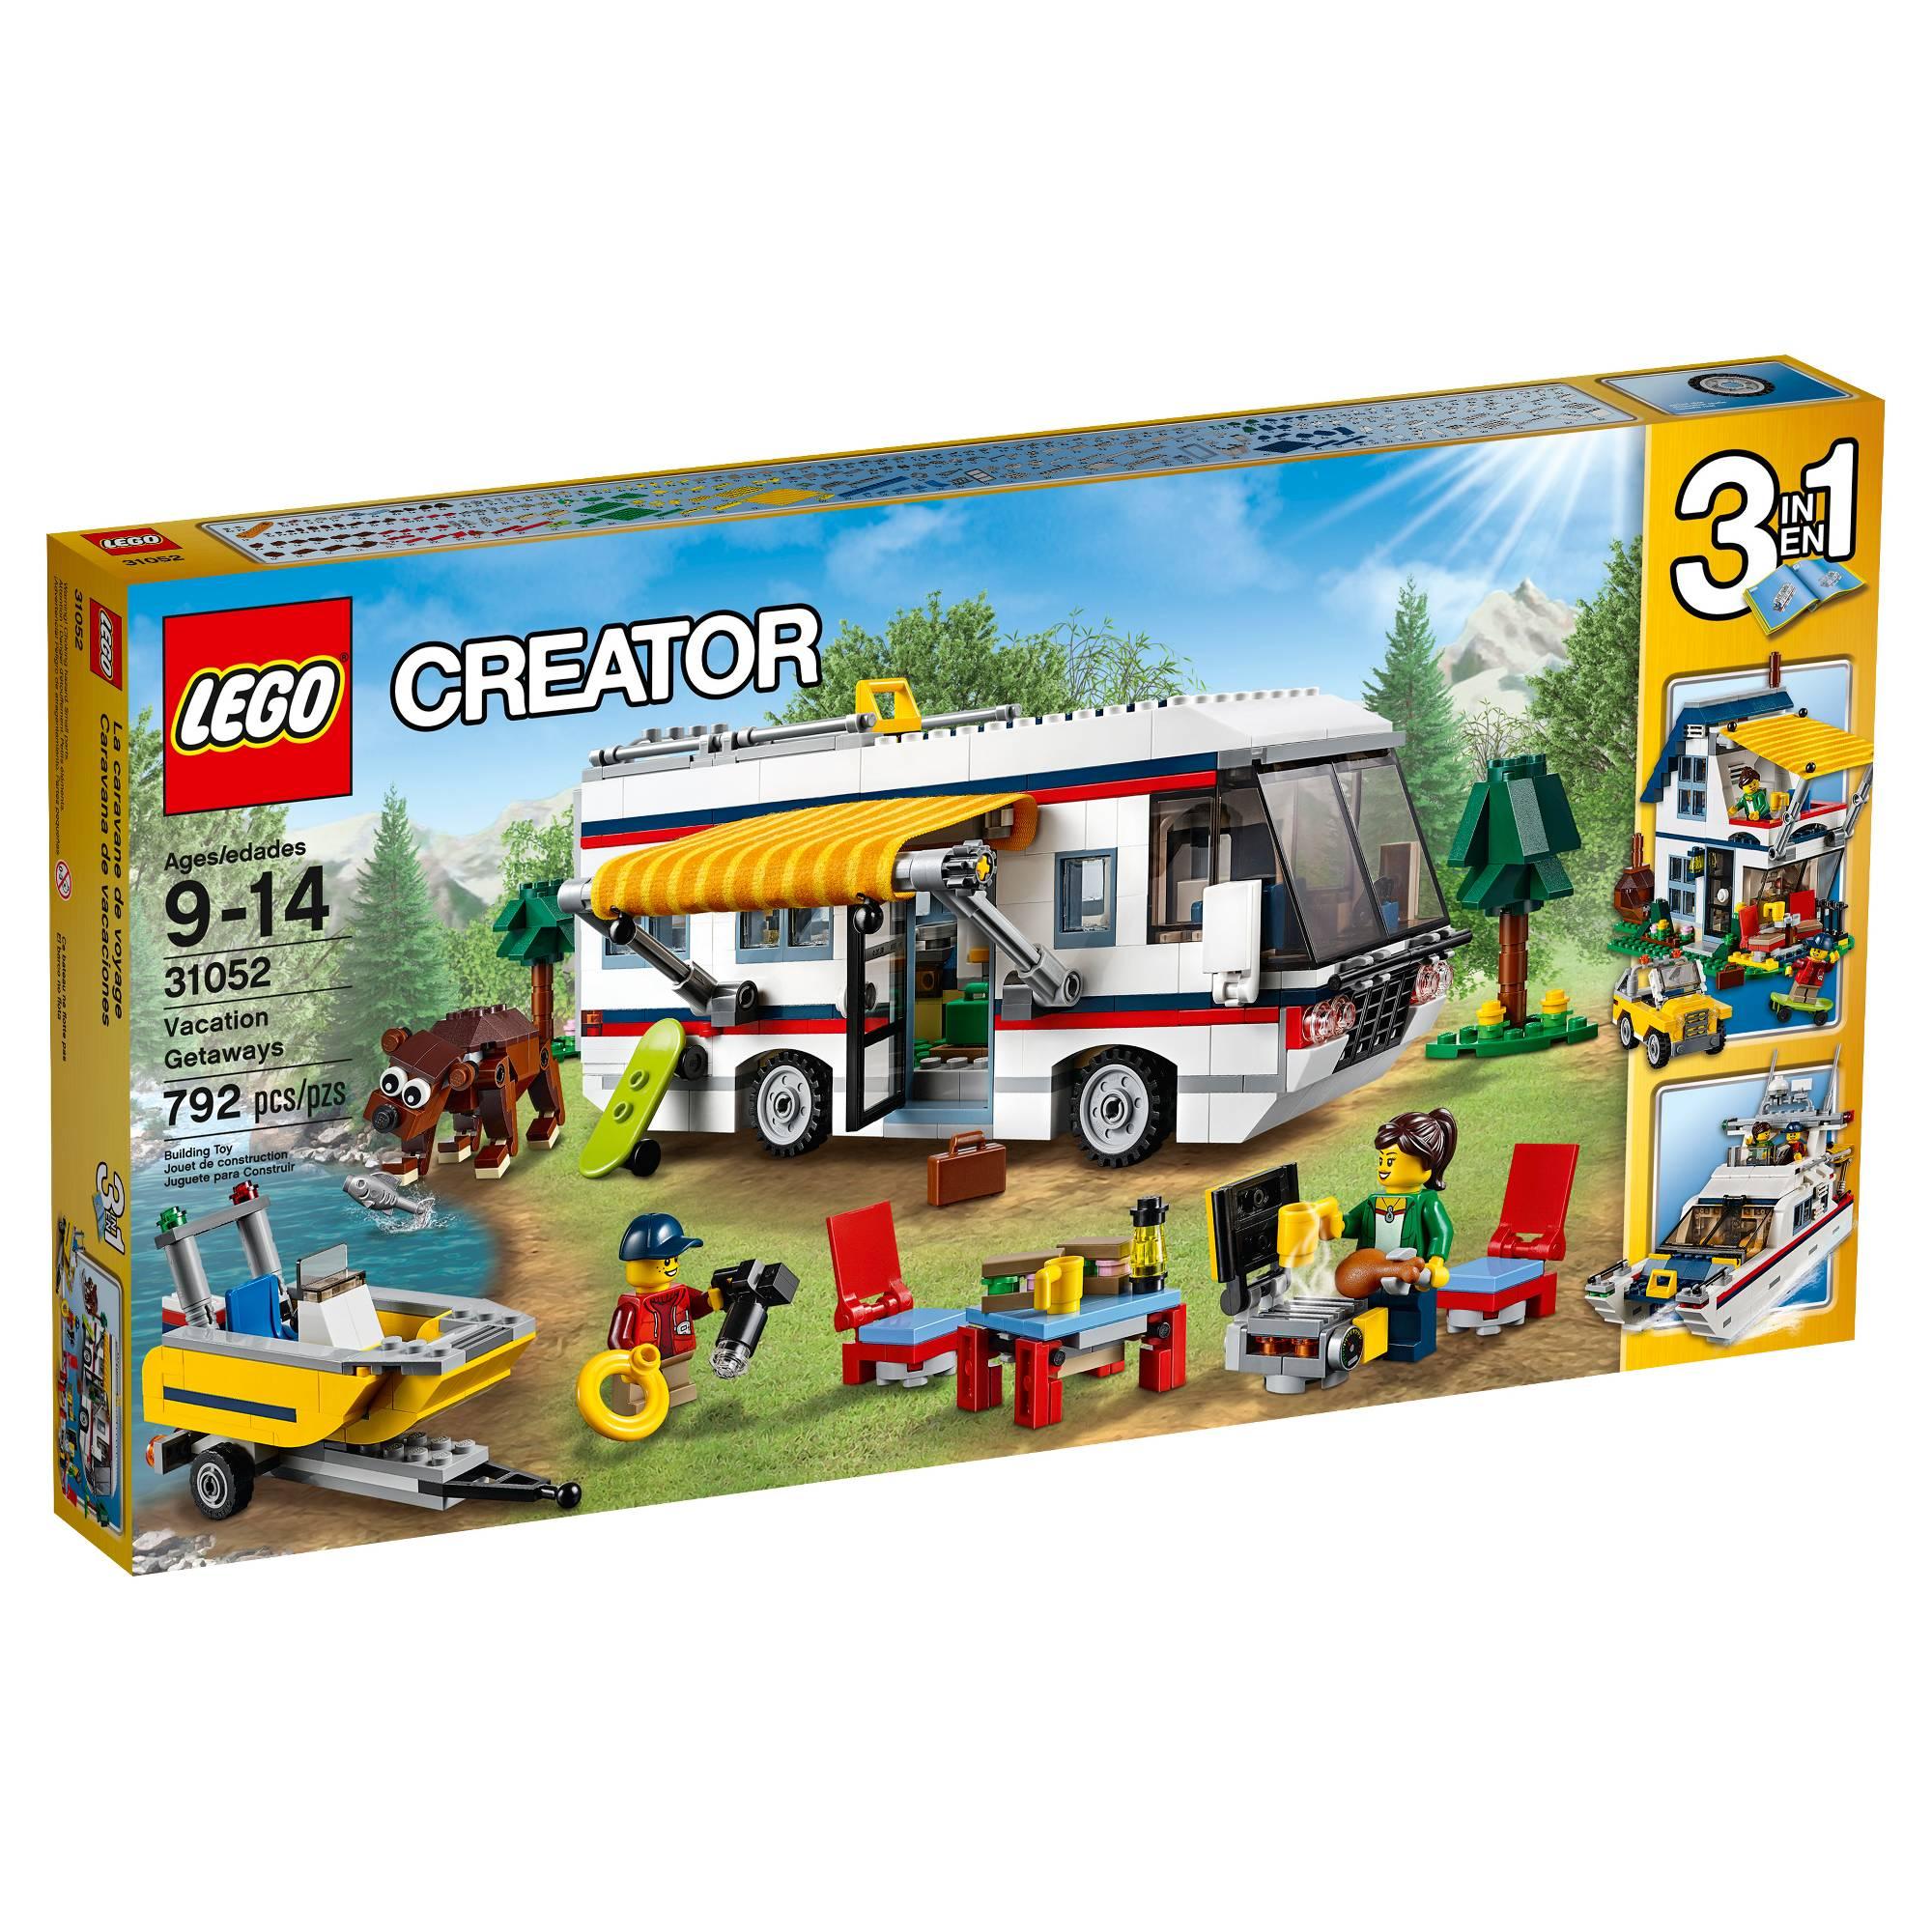 LEGO Creator Vacation Getaways Building Kit  $43 + Free Store Pickup